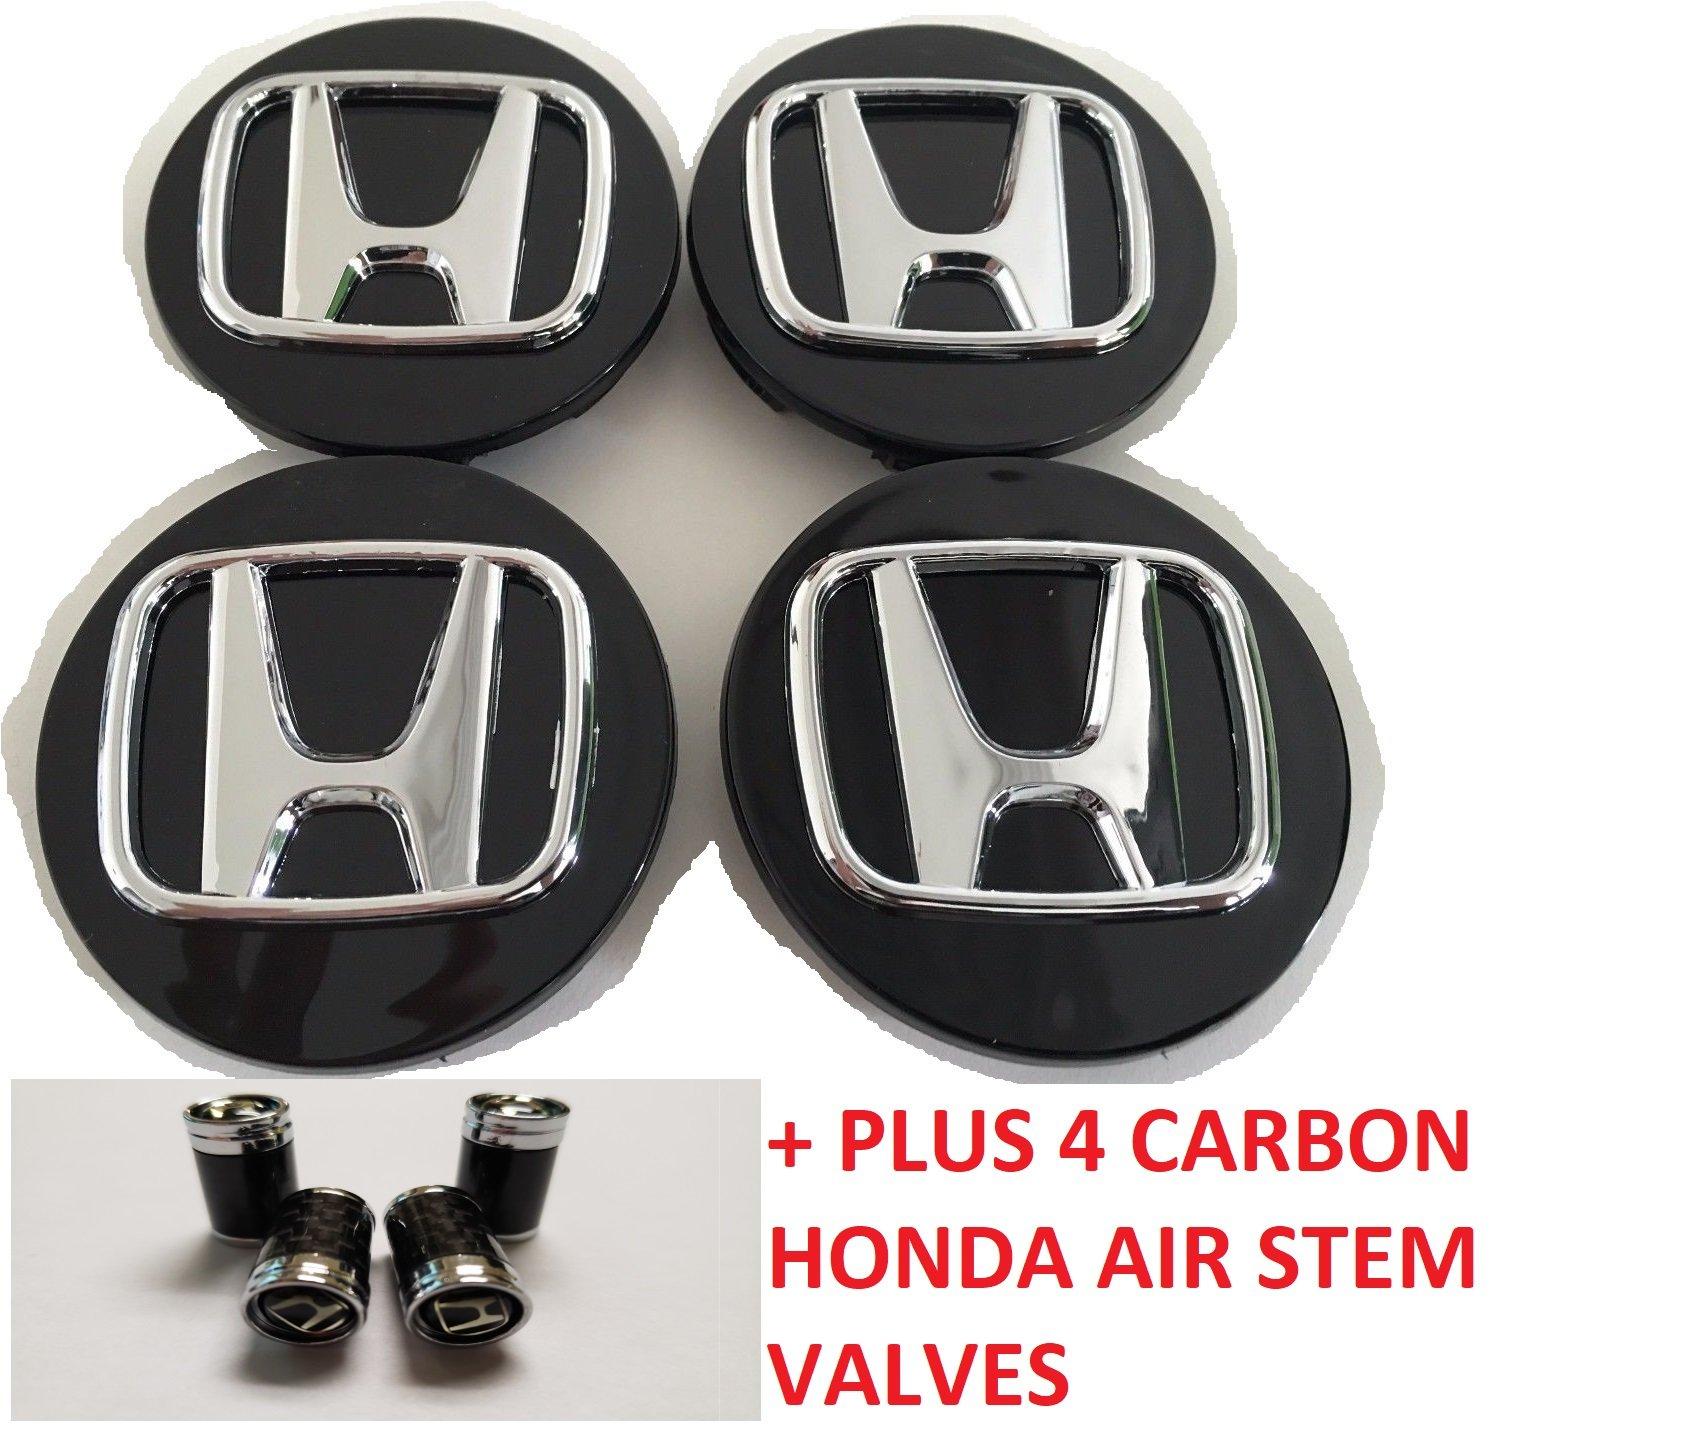 Honda Wheel Badge Center Caps Set of 4 69mm or 2.75 Black Accord Civic Pilot by RPOEnterprise (Image #1)